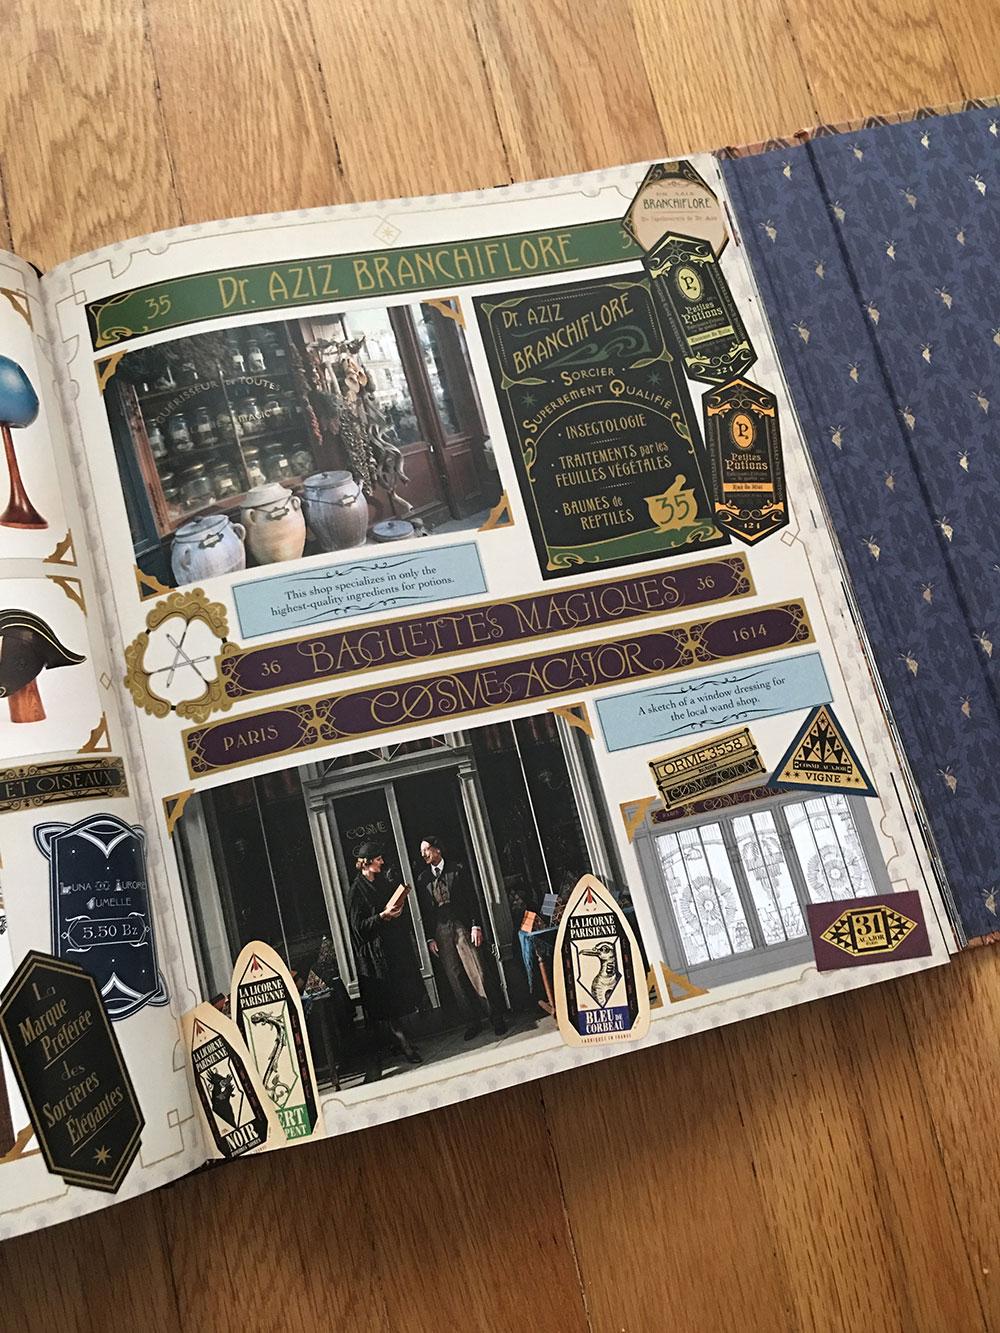 Details of wizarding Paris